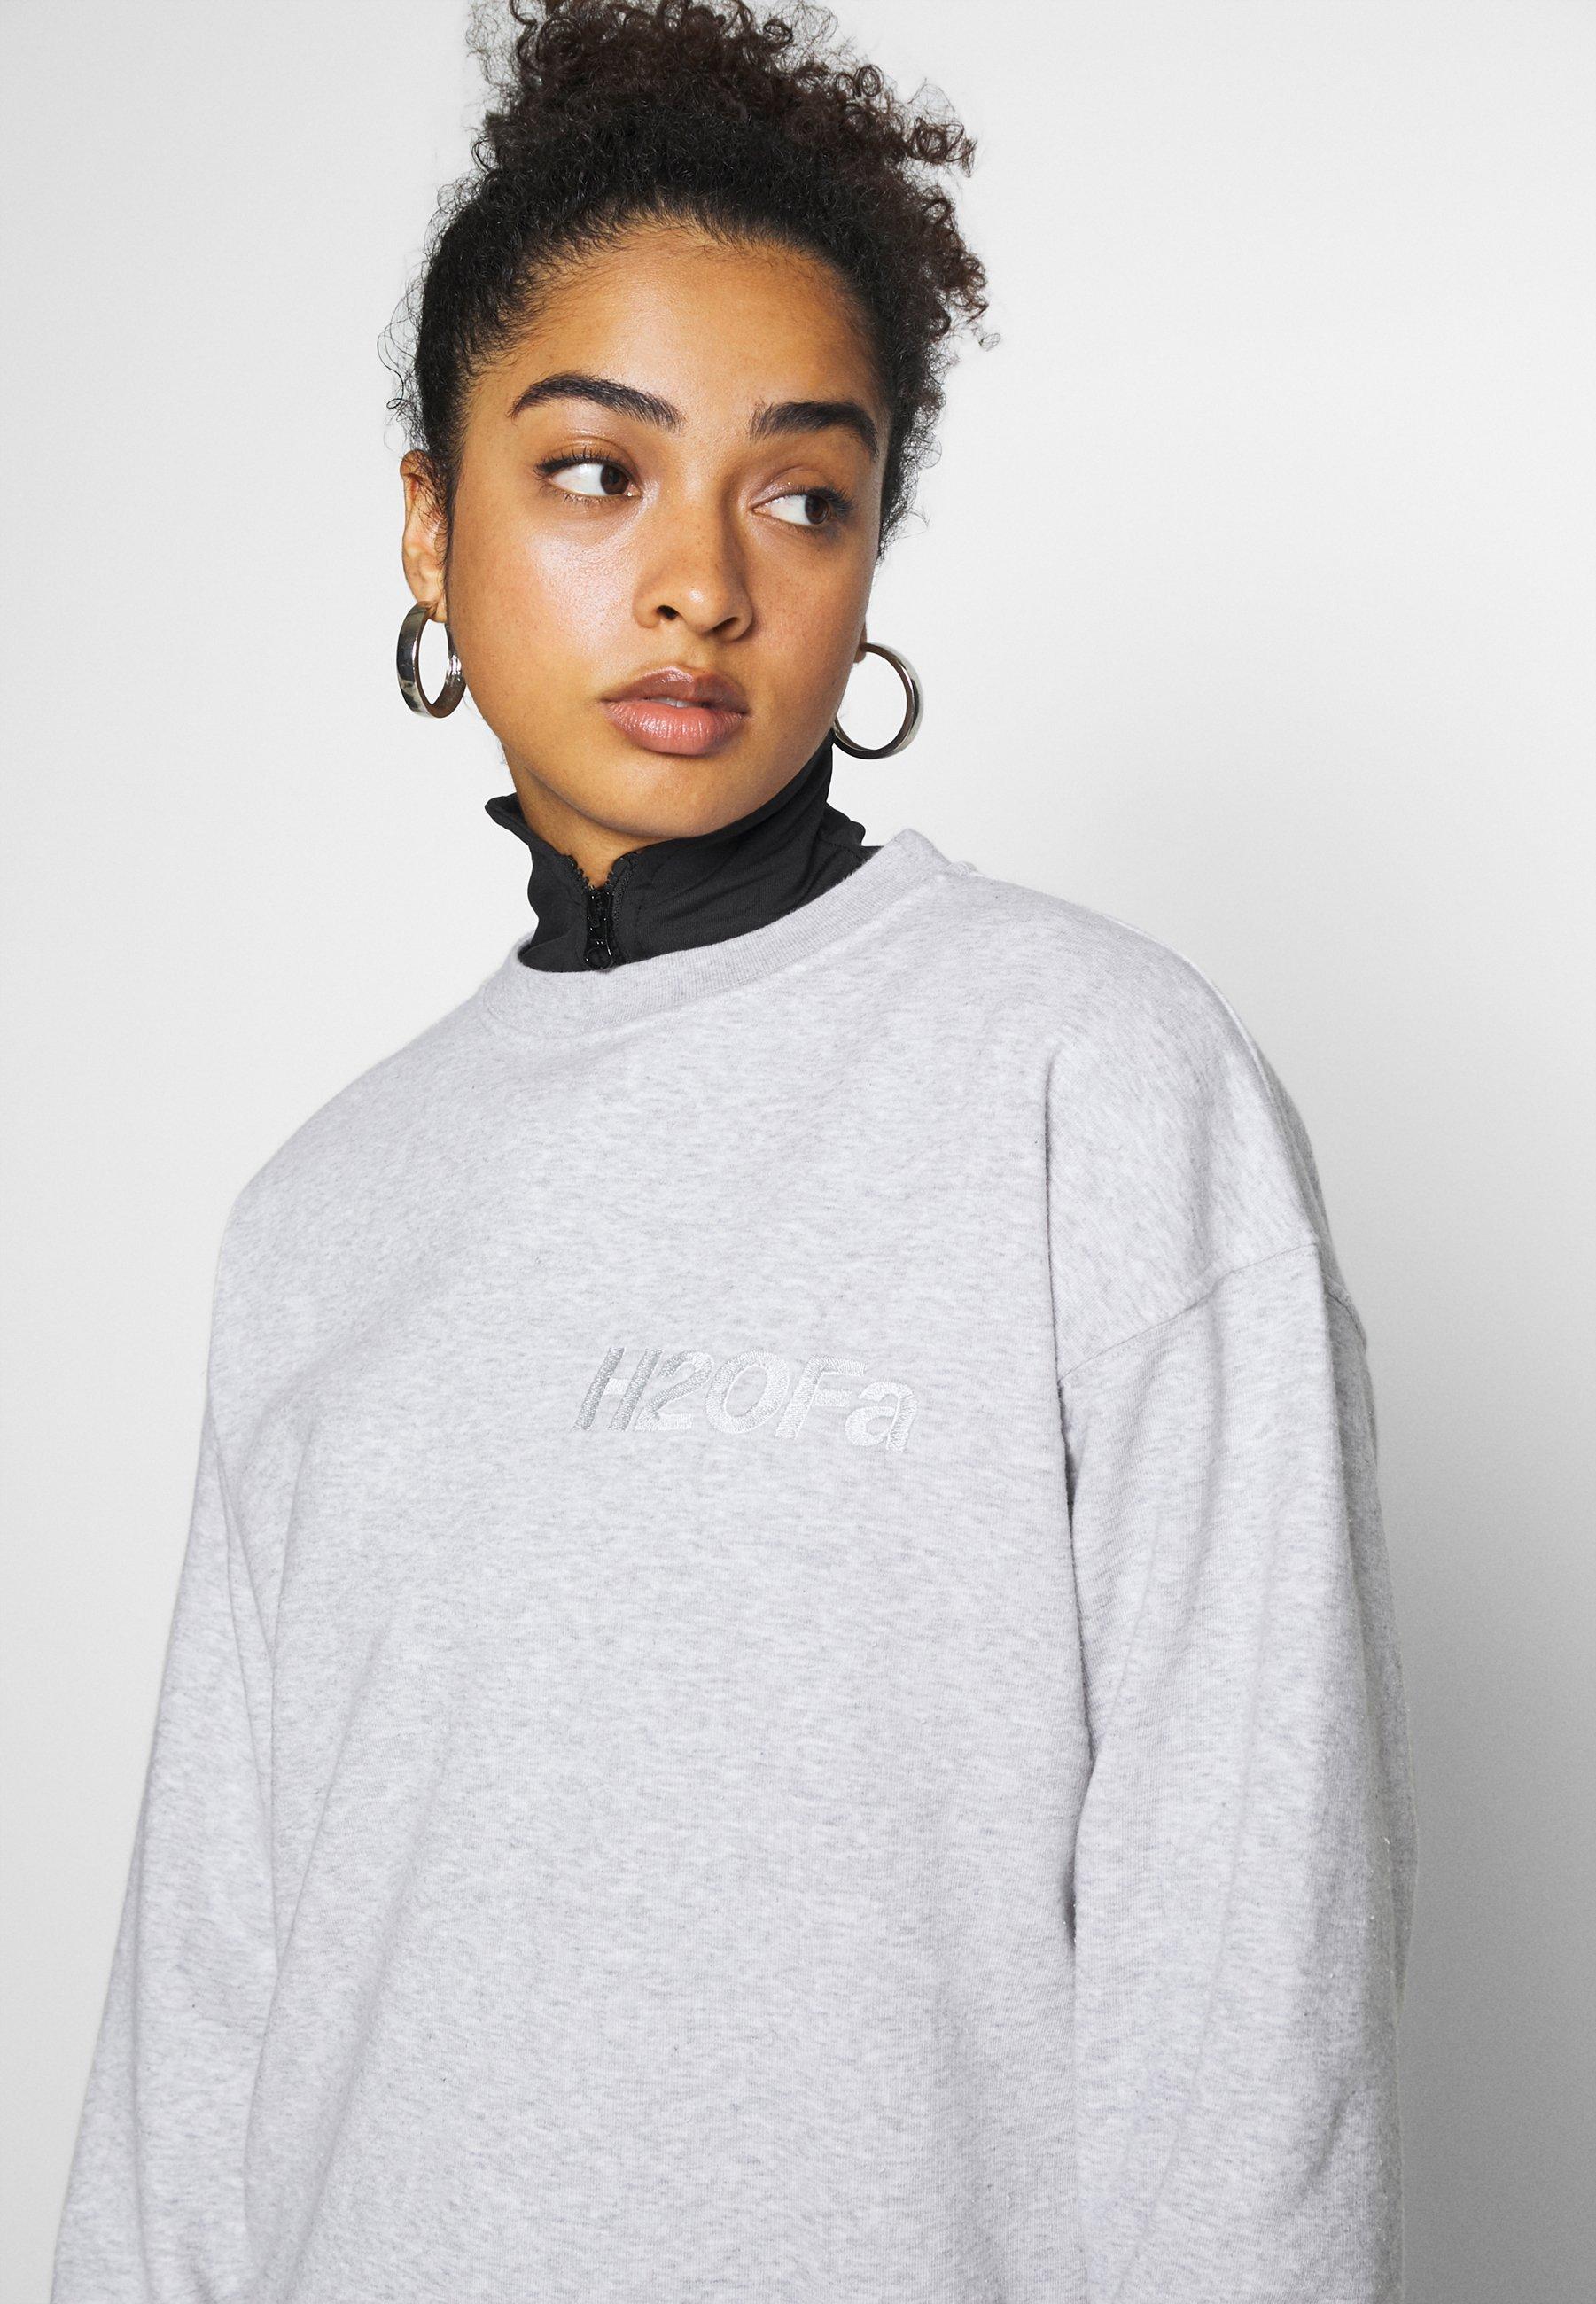 Cheap Women's Clothing H2O Fagerholt DOCTOR  O NECK Sweatshirt light grey melange I8EsOSD3D